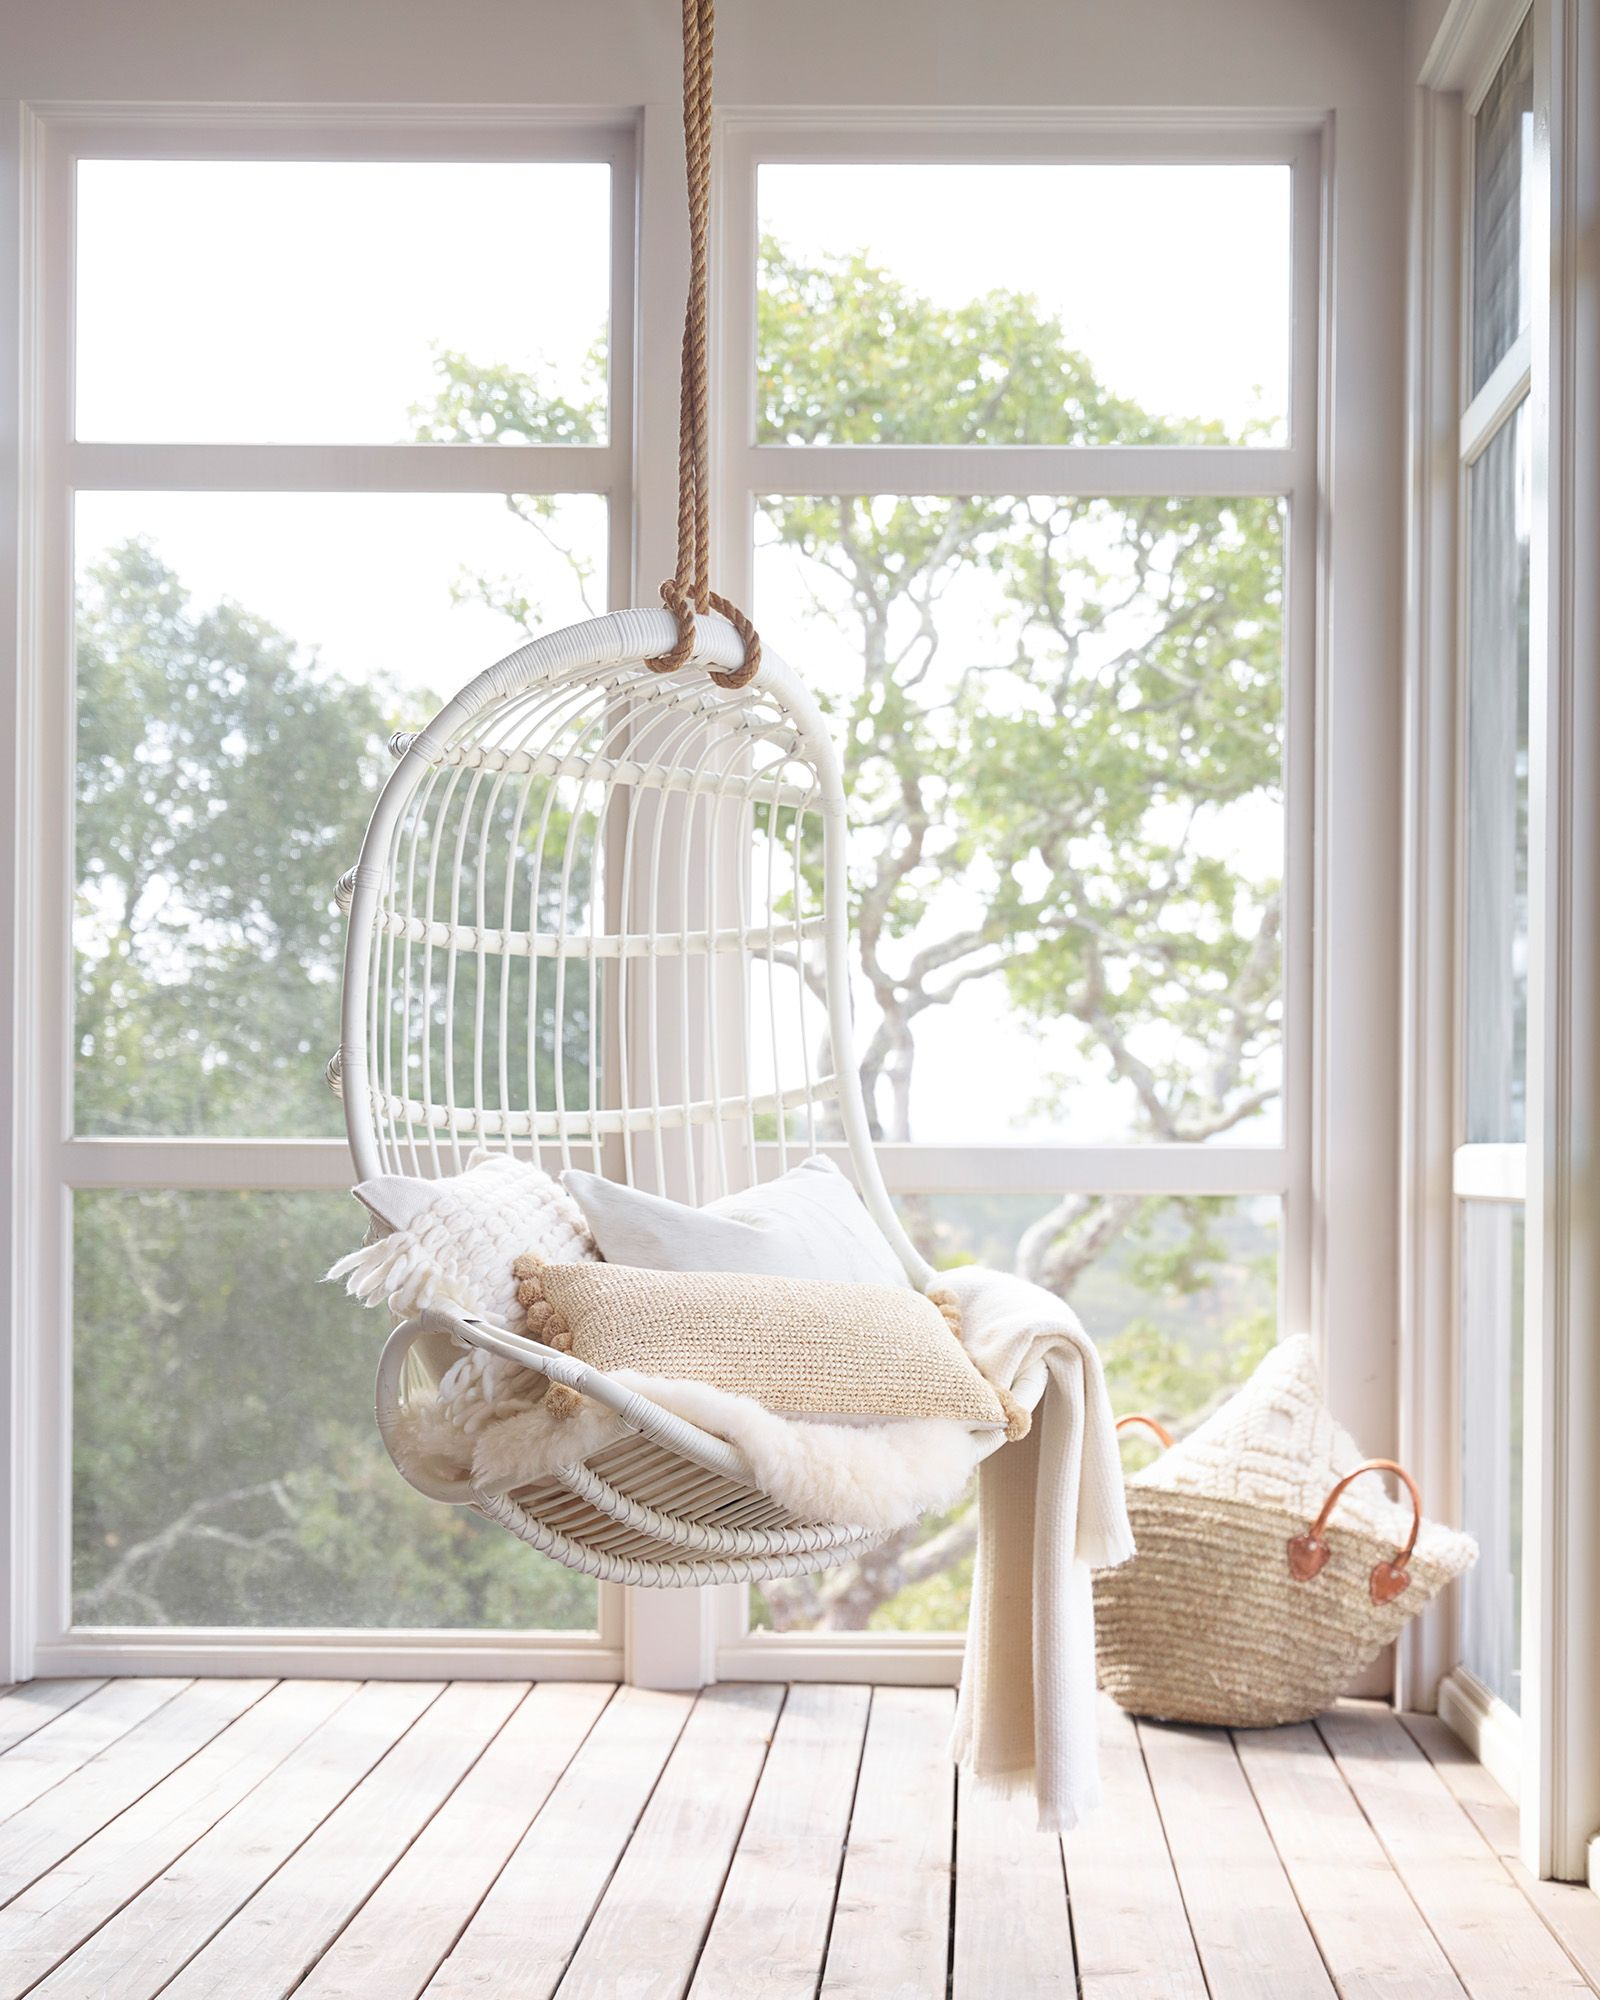 Tremendous Serena Lily Hanging Rattan Chair Boho Chic In 2019 Machost Co Dining Chair Design Ideas Machostcouk